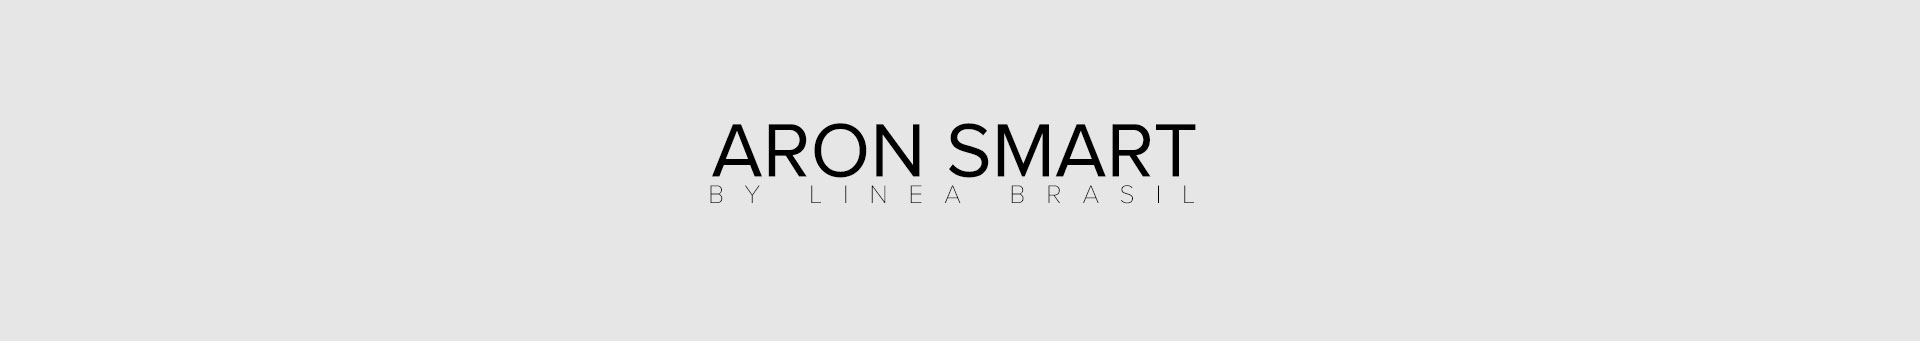 Aron Smart Entertainment Center